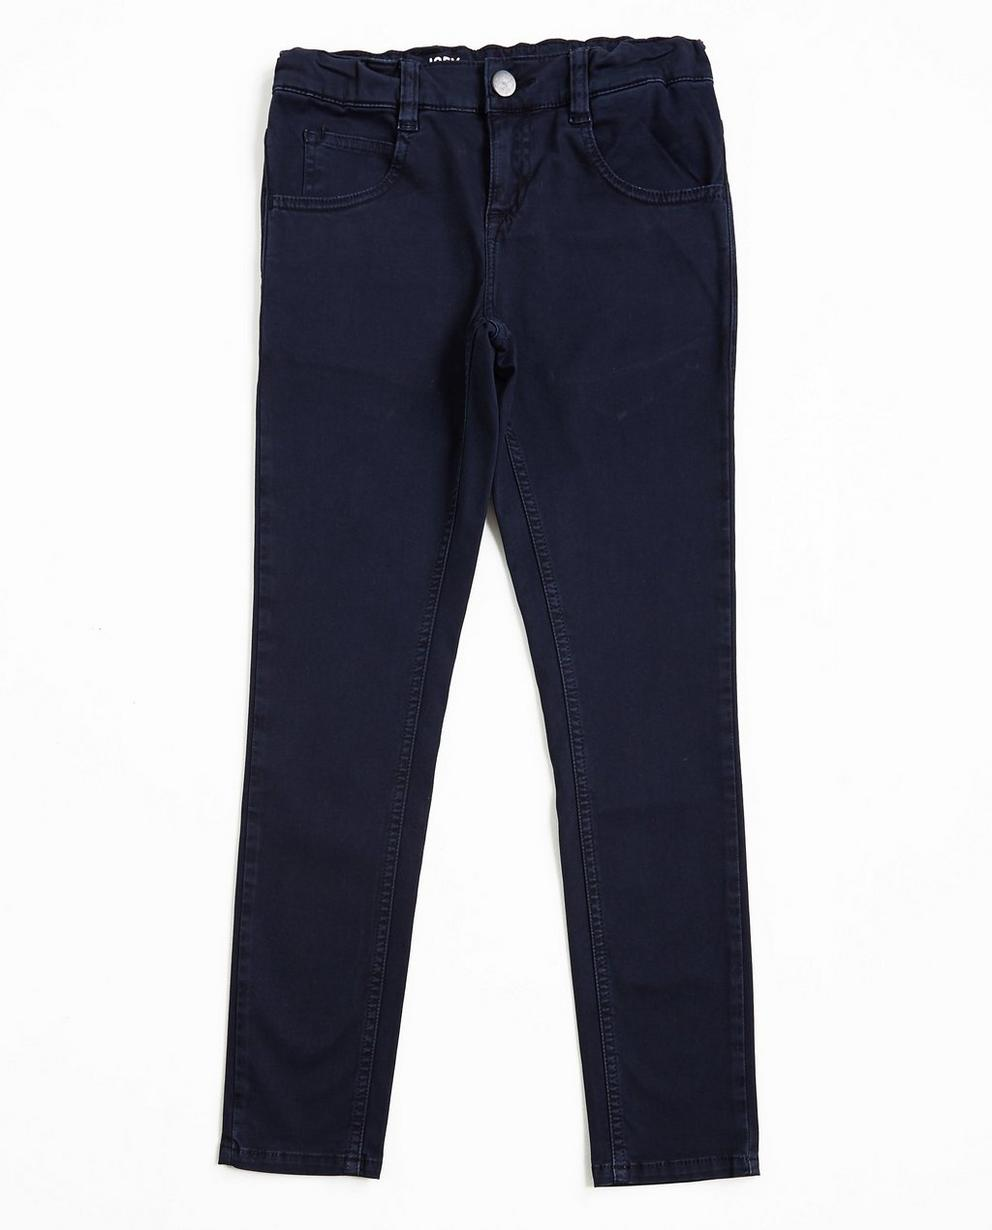 Nachtblaue Jeans - skinny Schnittform - JBC